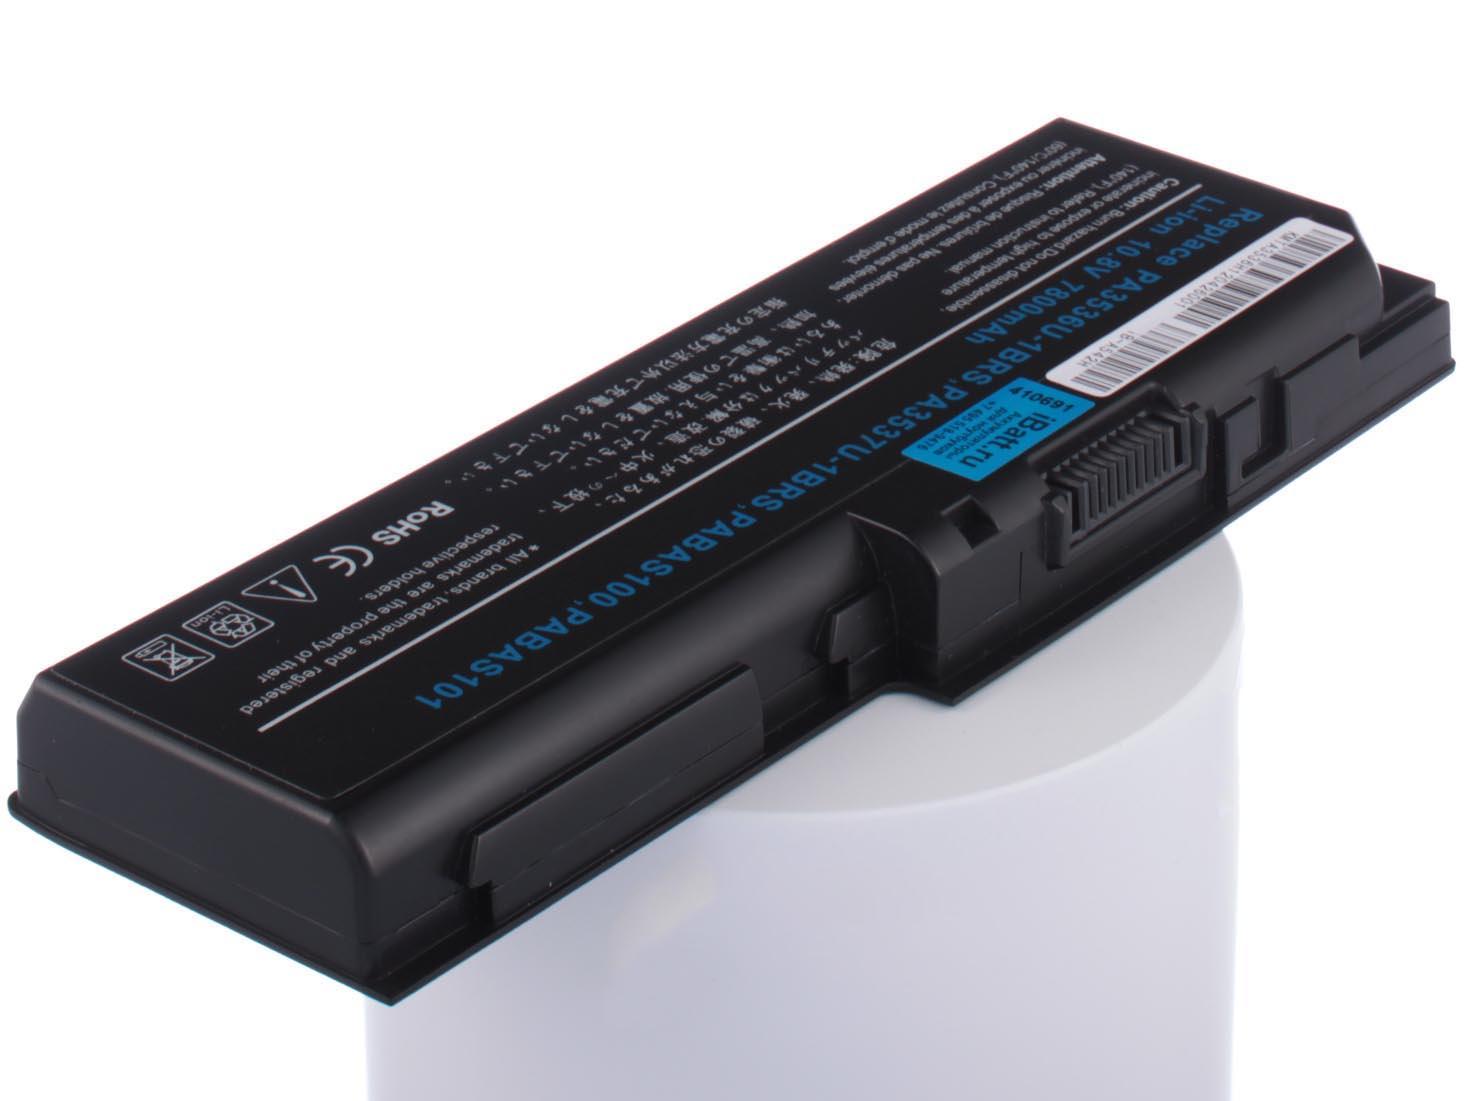 Аккумулятор для ноутбука iBatt для ToshiBa Satellite P200D-11L, Satellite X200-21K, Satellite X200-15K, Satellite X205-S9359, Satellite L350-184, Satellite P200-14H, Satellite L350-20F, Satellite Pro L350, Satellite X205-S7483 аккумулятор gerffins для samsung e1050 e1085 x200